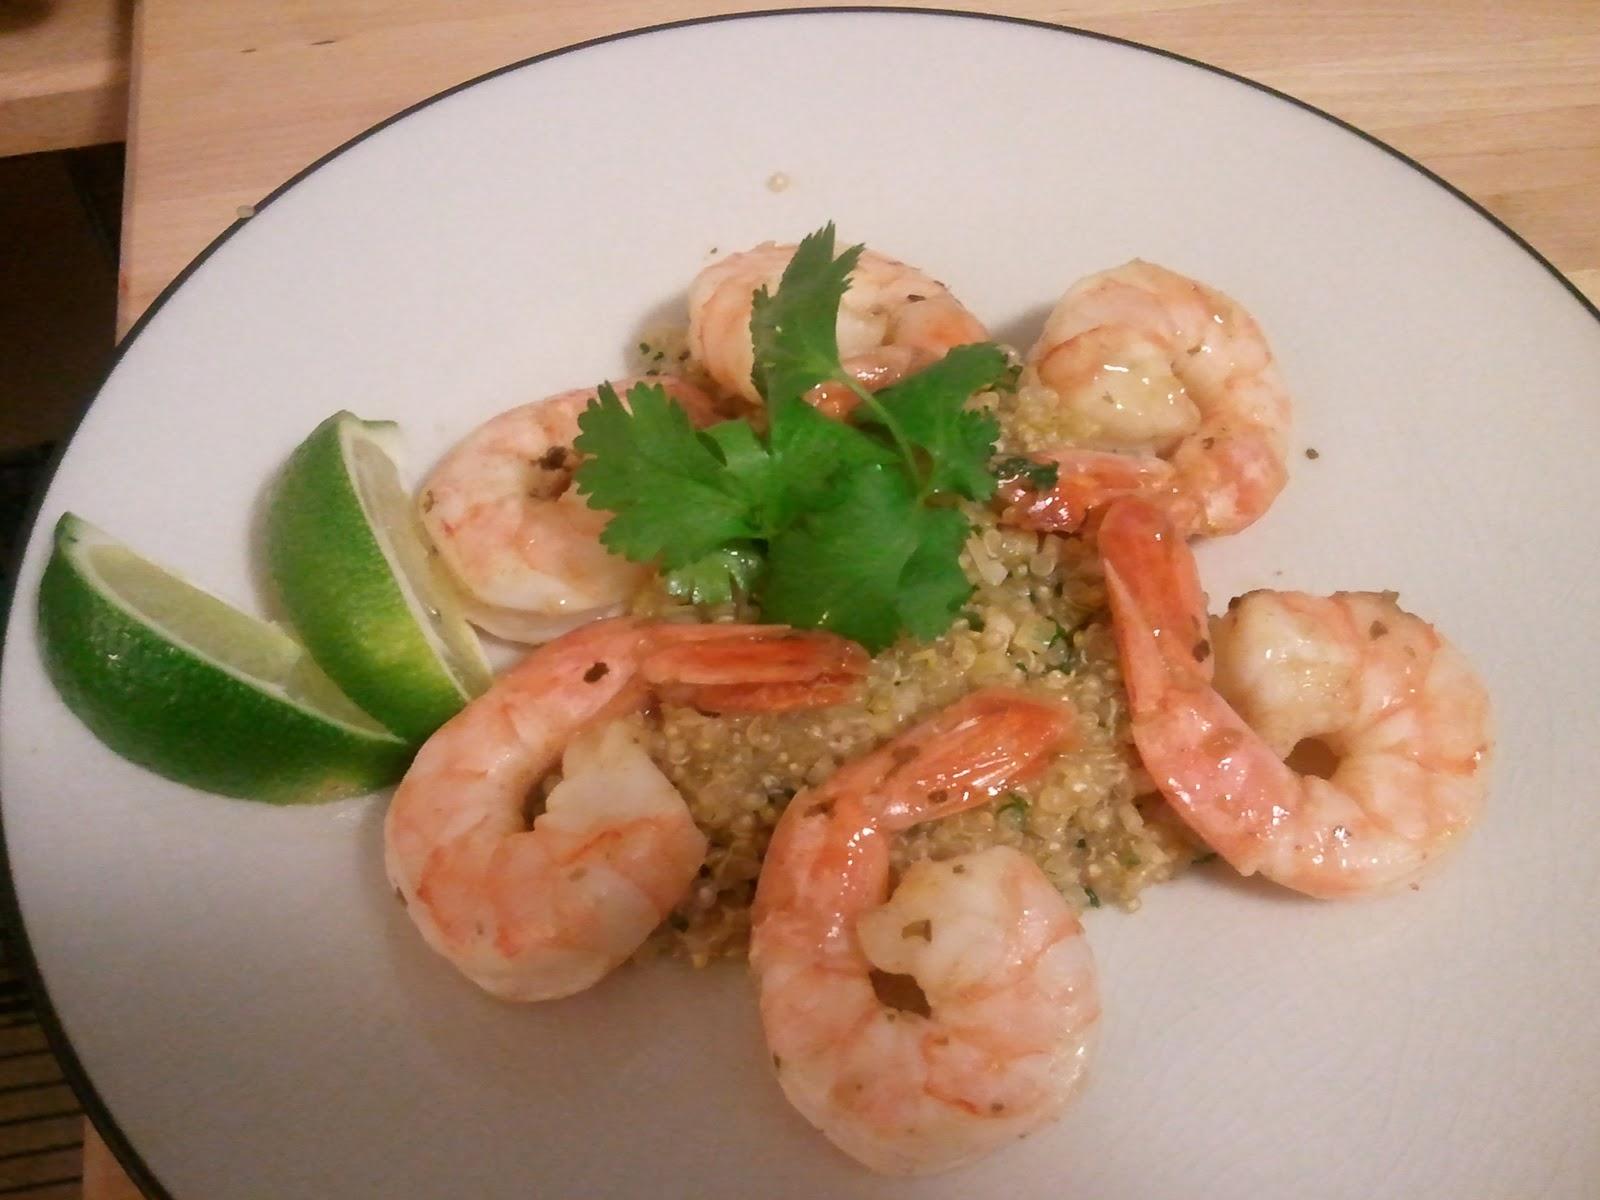 Engineer and an Oven: Tom Yum Quinoa and Lemongrass Shrimp